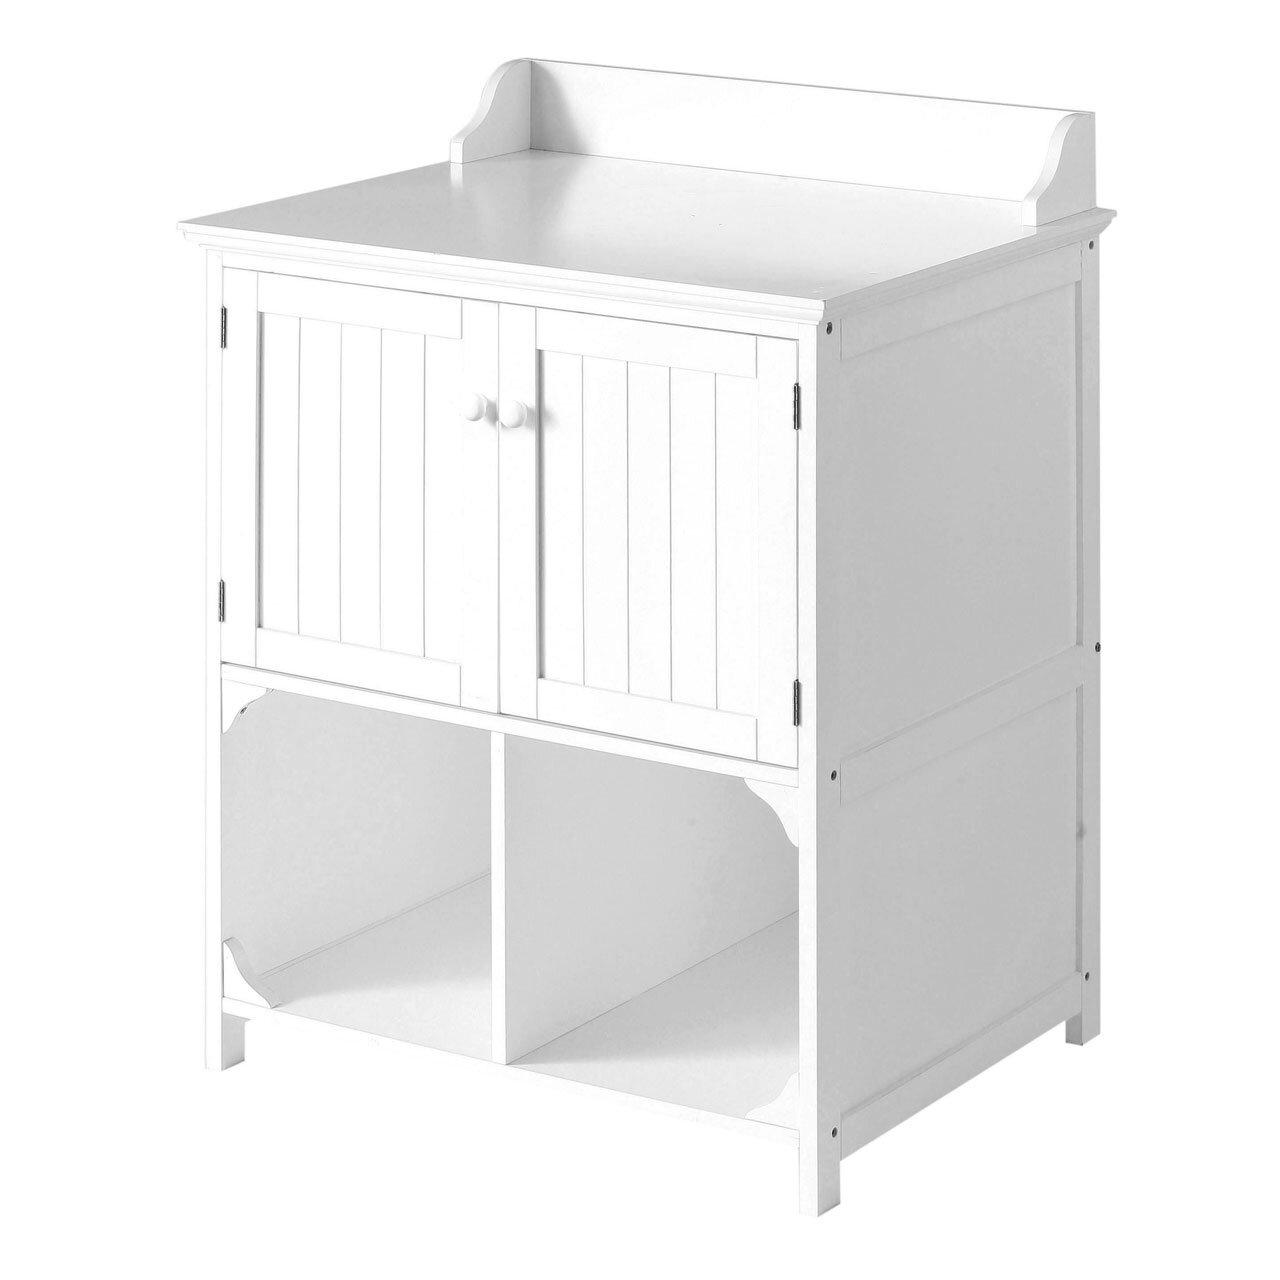 Tall Bathroom Storage Cabinet With Laundry Bin Manchester Inspirations Deebonk